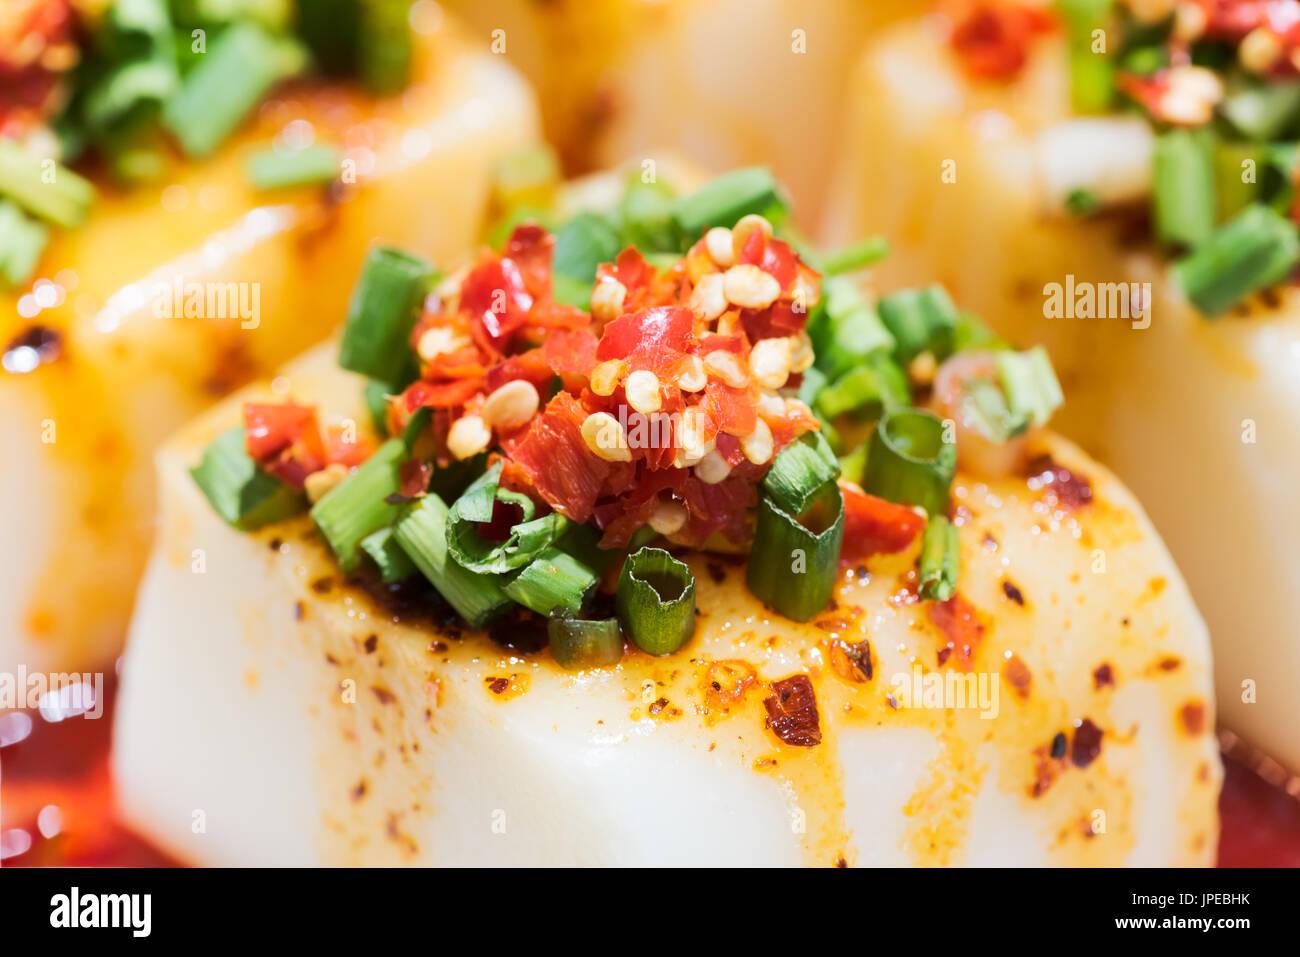 Chinesischer Tofu mit Chili-Pfeffer-Sauce - chinesisches Essen Stockbild